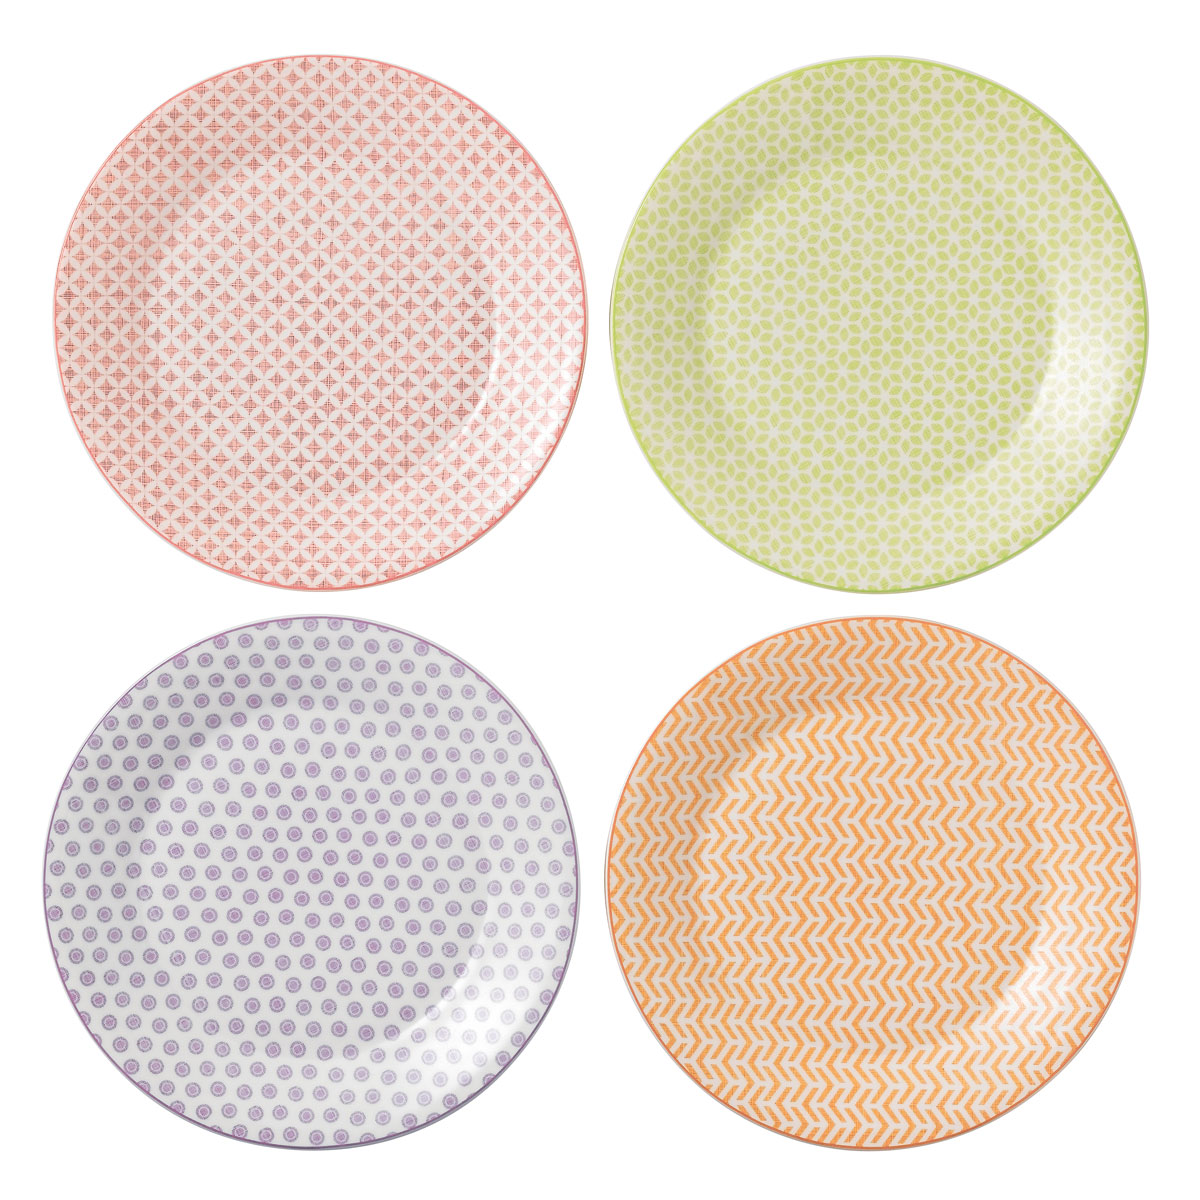 "Royal Doulton Pastels Accent Plates 9"" Set of 4 Mixed Patterns"